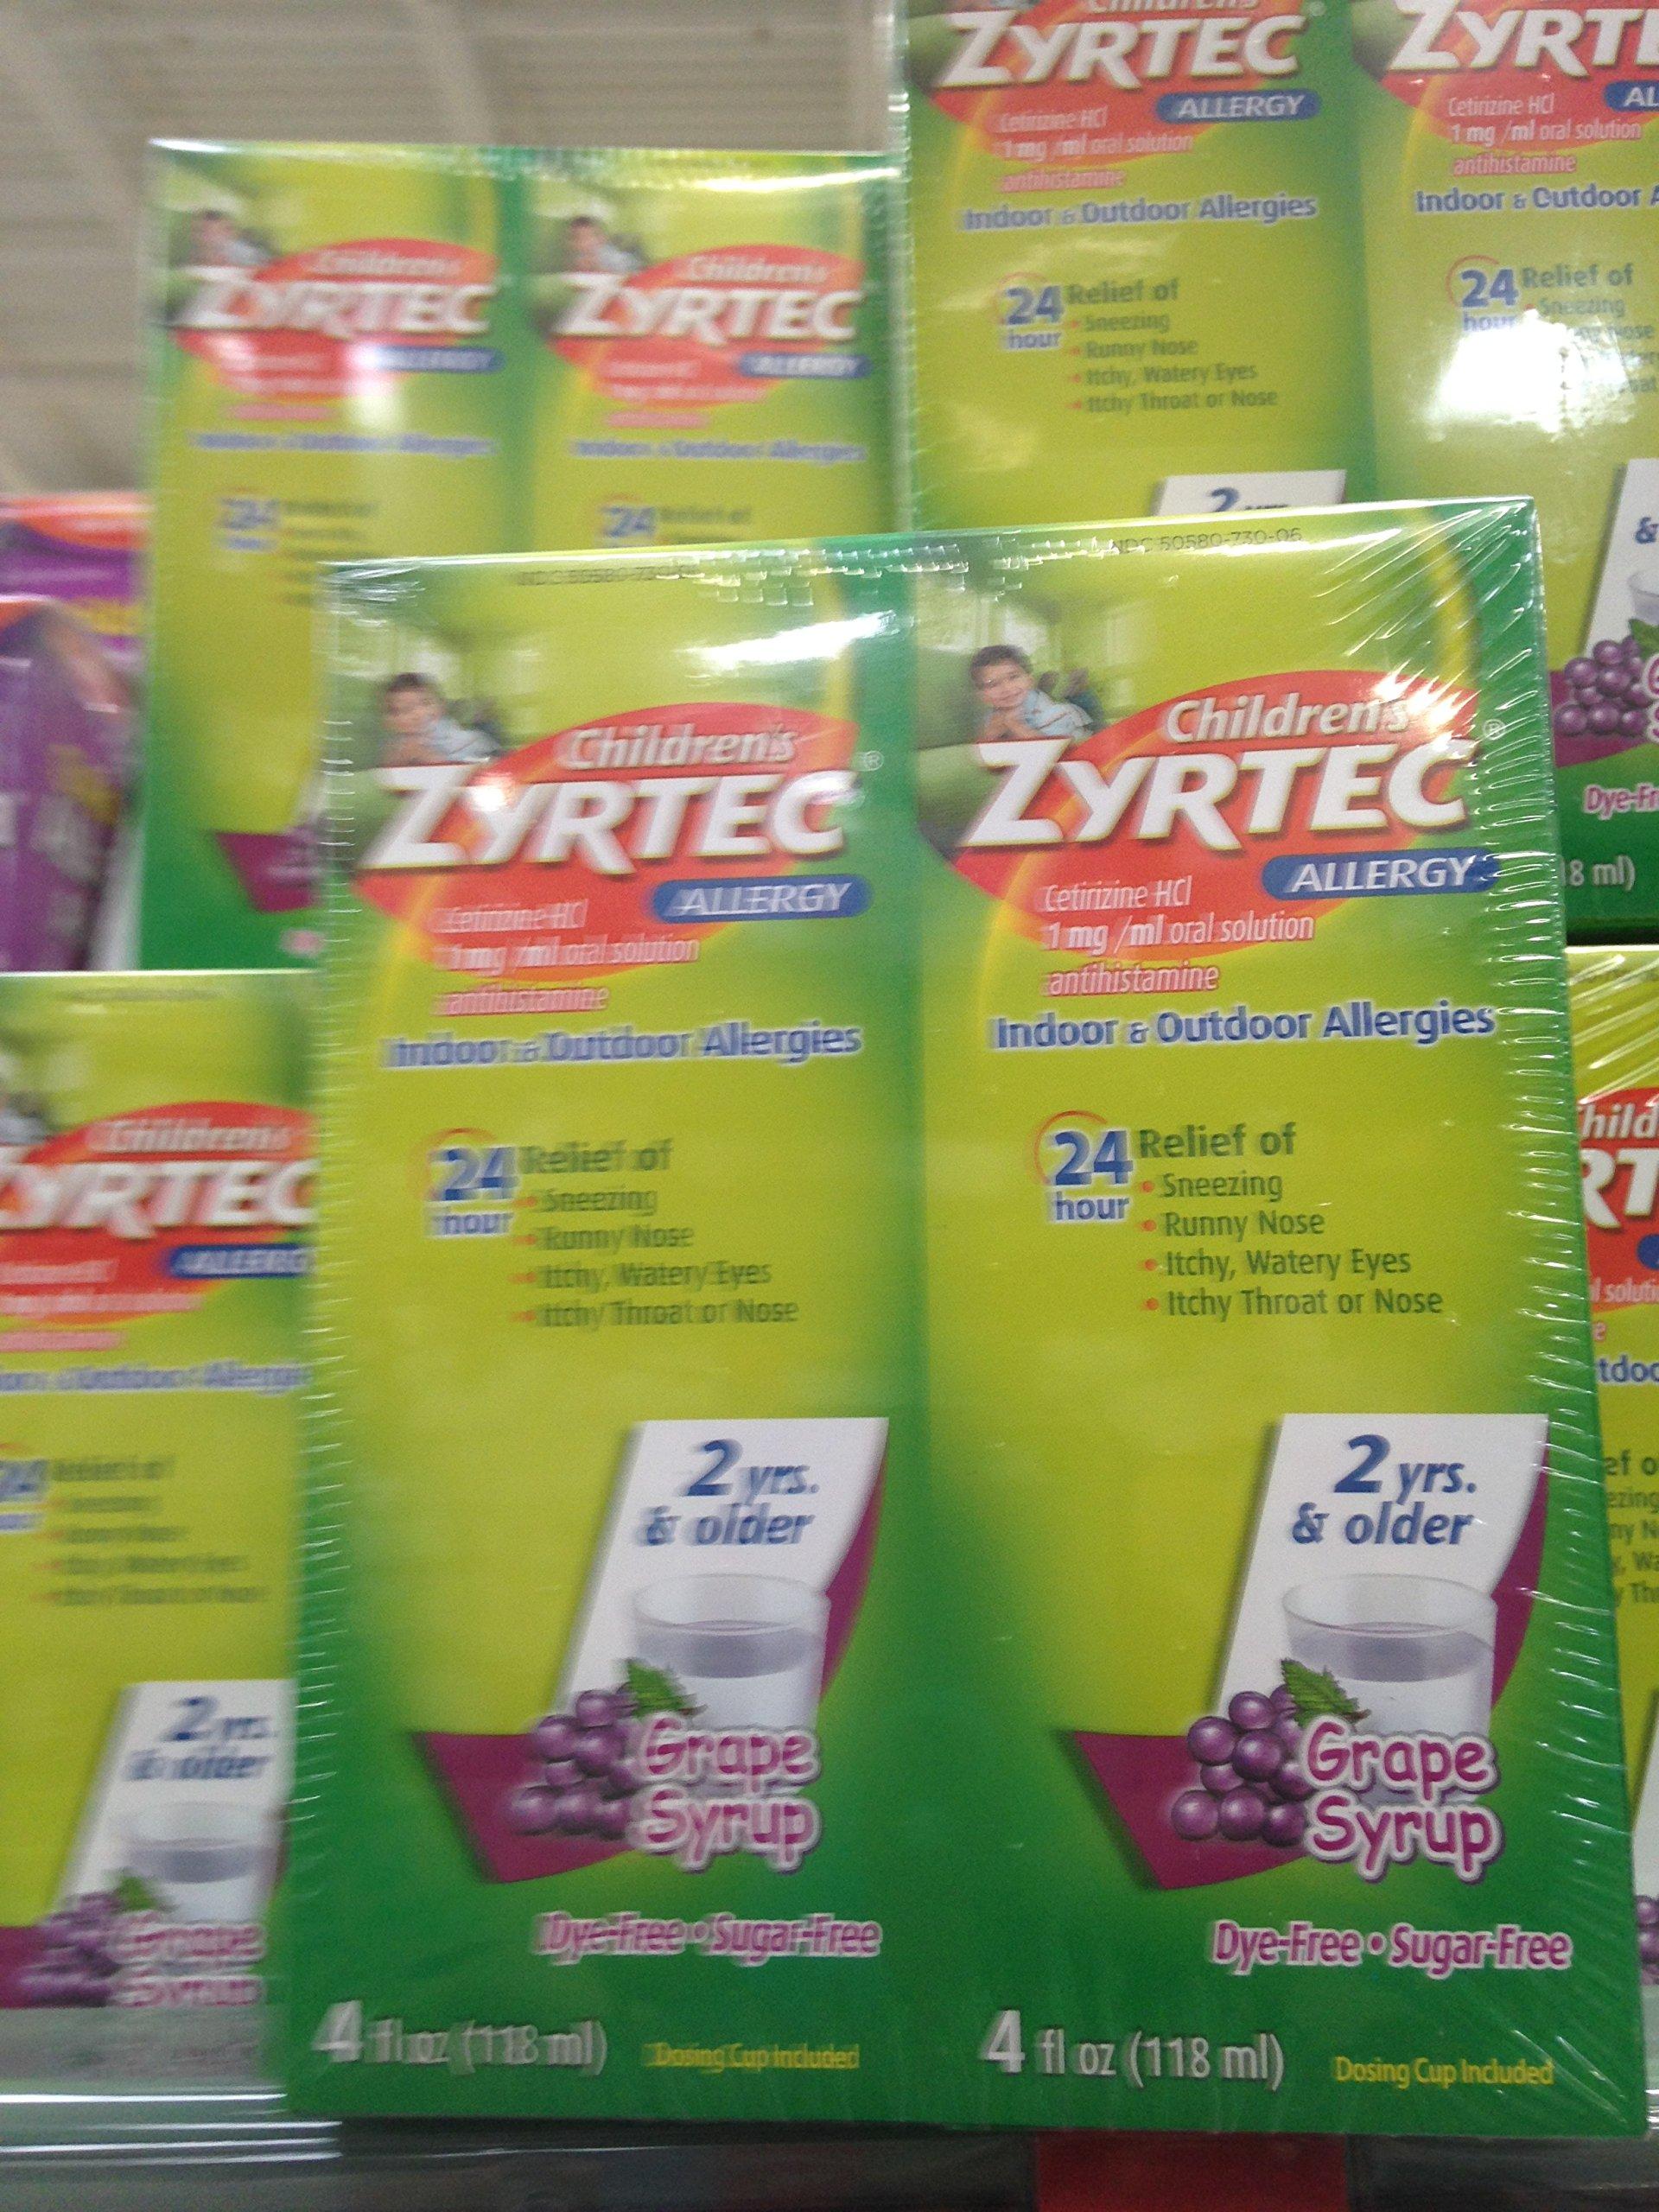 Zyrtec Allergy children's grape flavored 2x 4 oz (pack of 6)